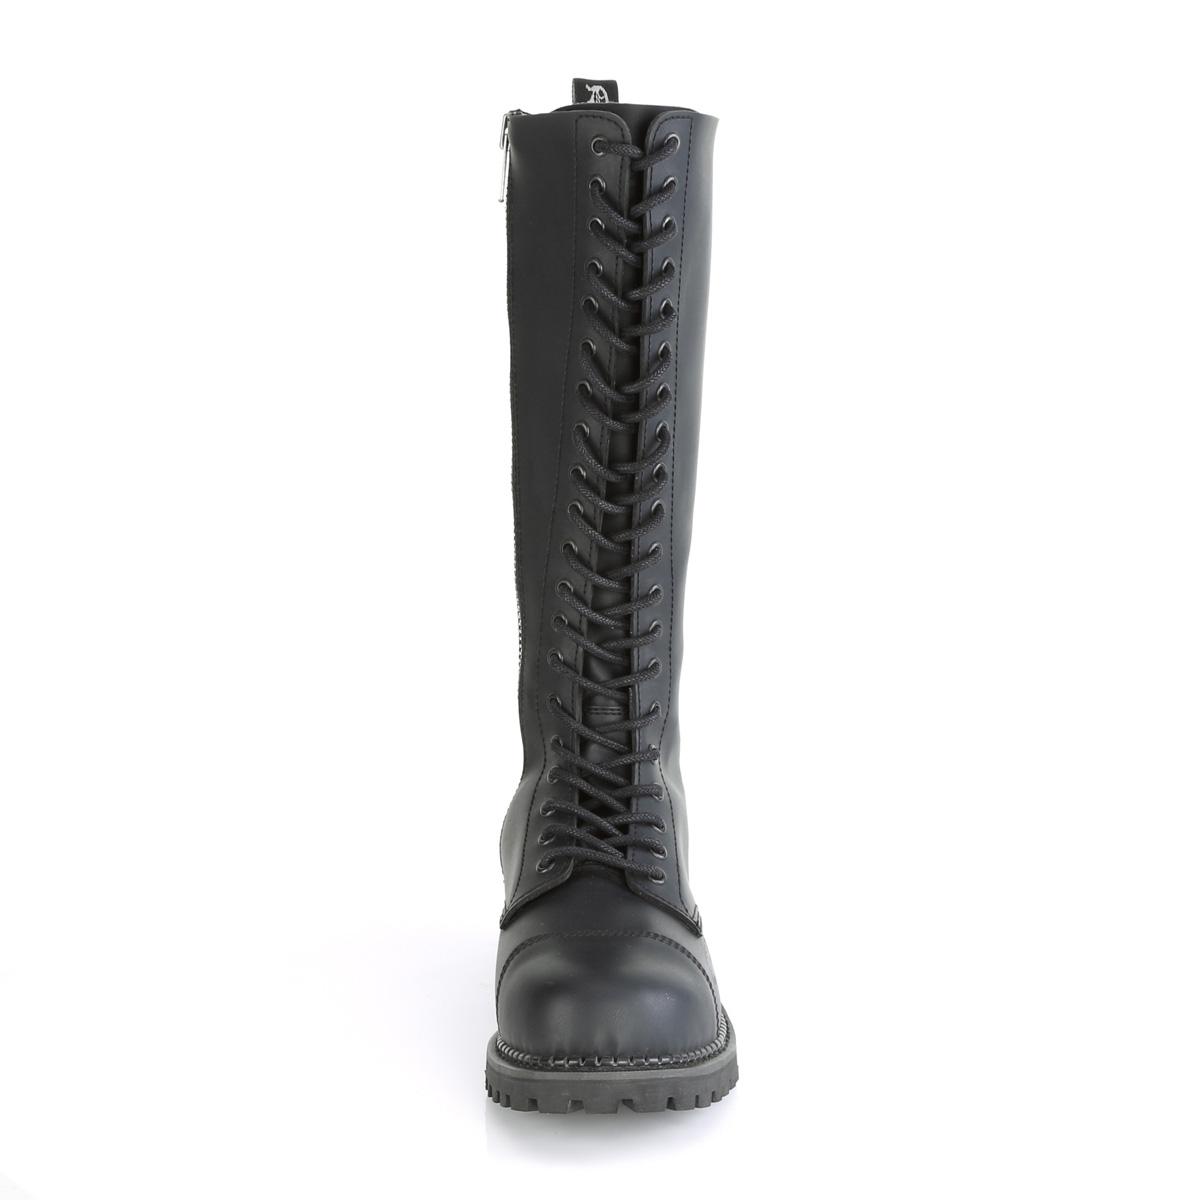 Demonia(デモニア) RIOT-20 スティールトゥ 編み上げブーツ 20アイレット コンバットブーツ ヴィーガンレザー(合皮) #Men's/Unisex◆取り寄せ